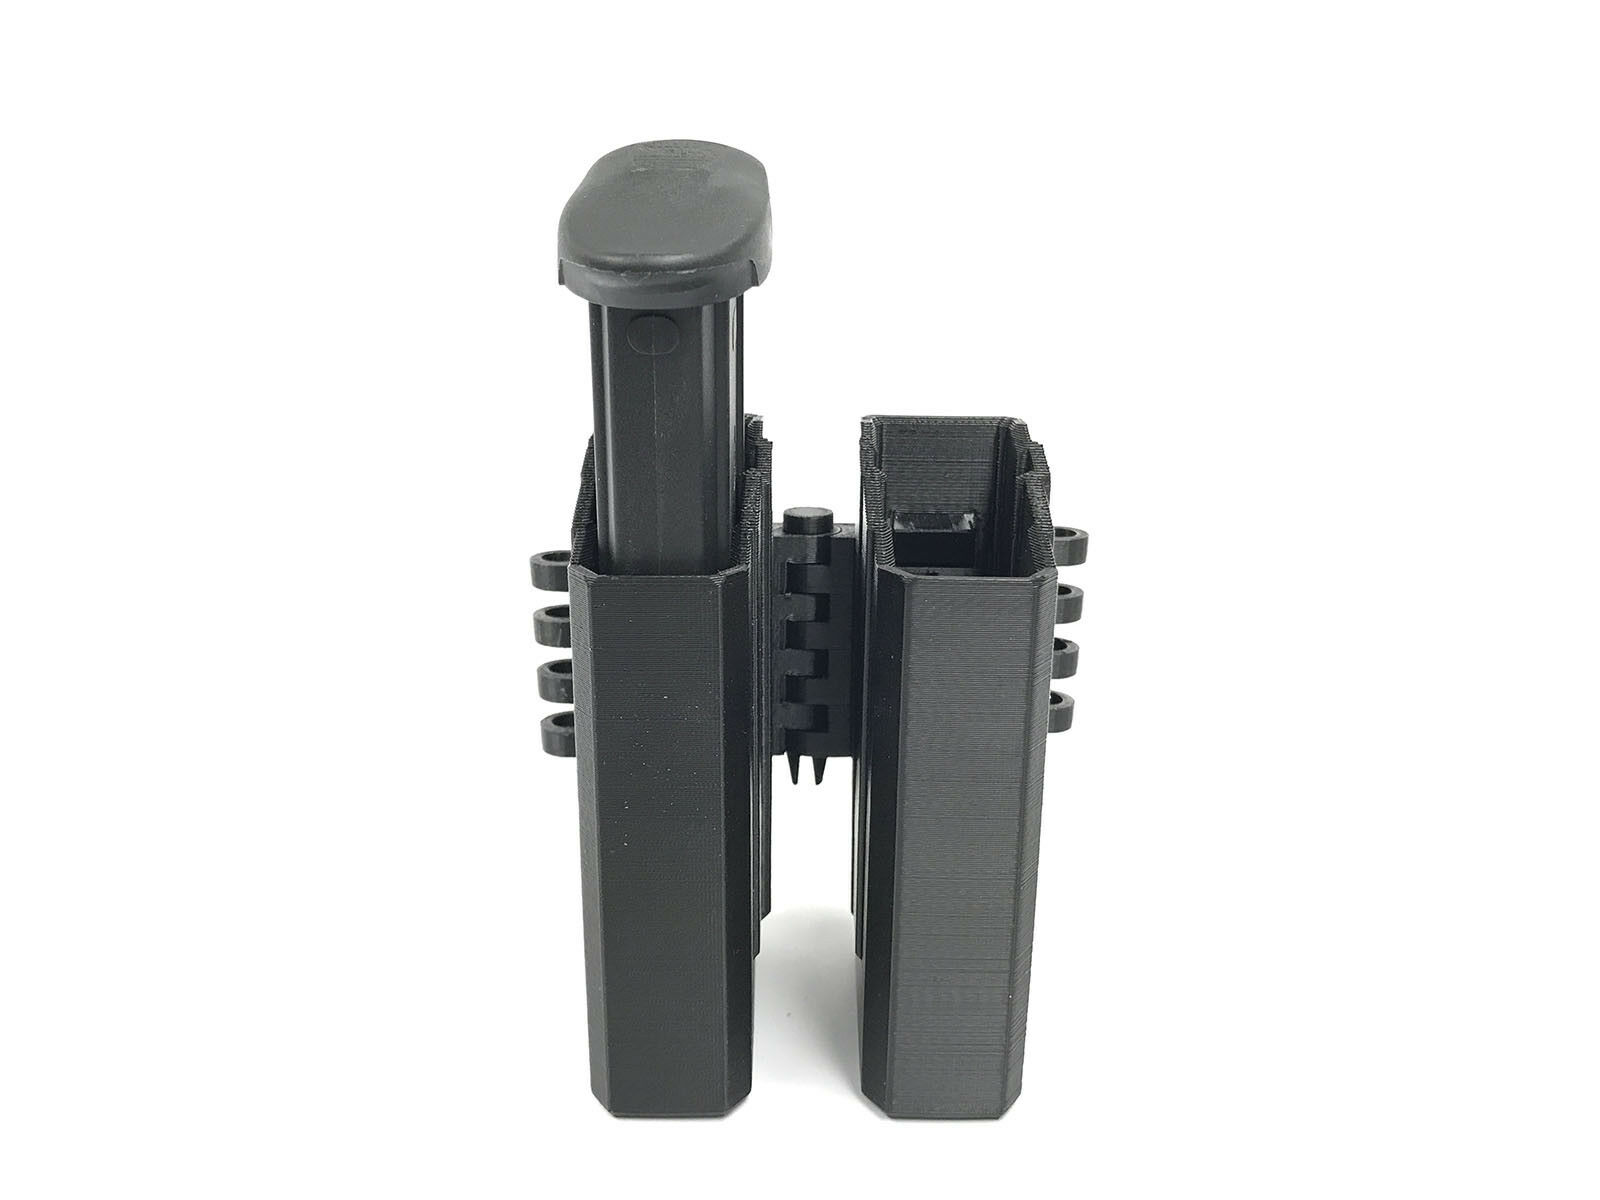 EAMP Enforcer - FN Five SeveN (5.7) Dual Mag Pouch - MagP0474-B